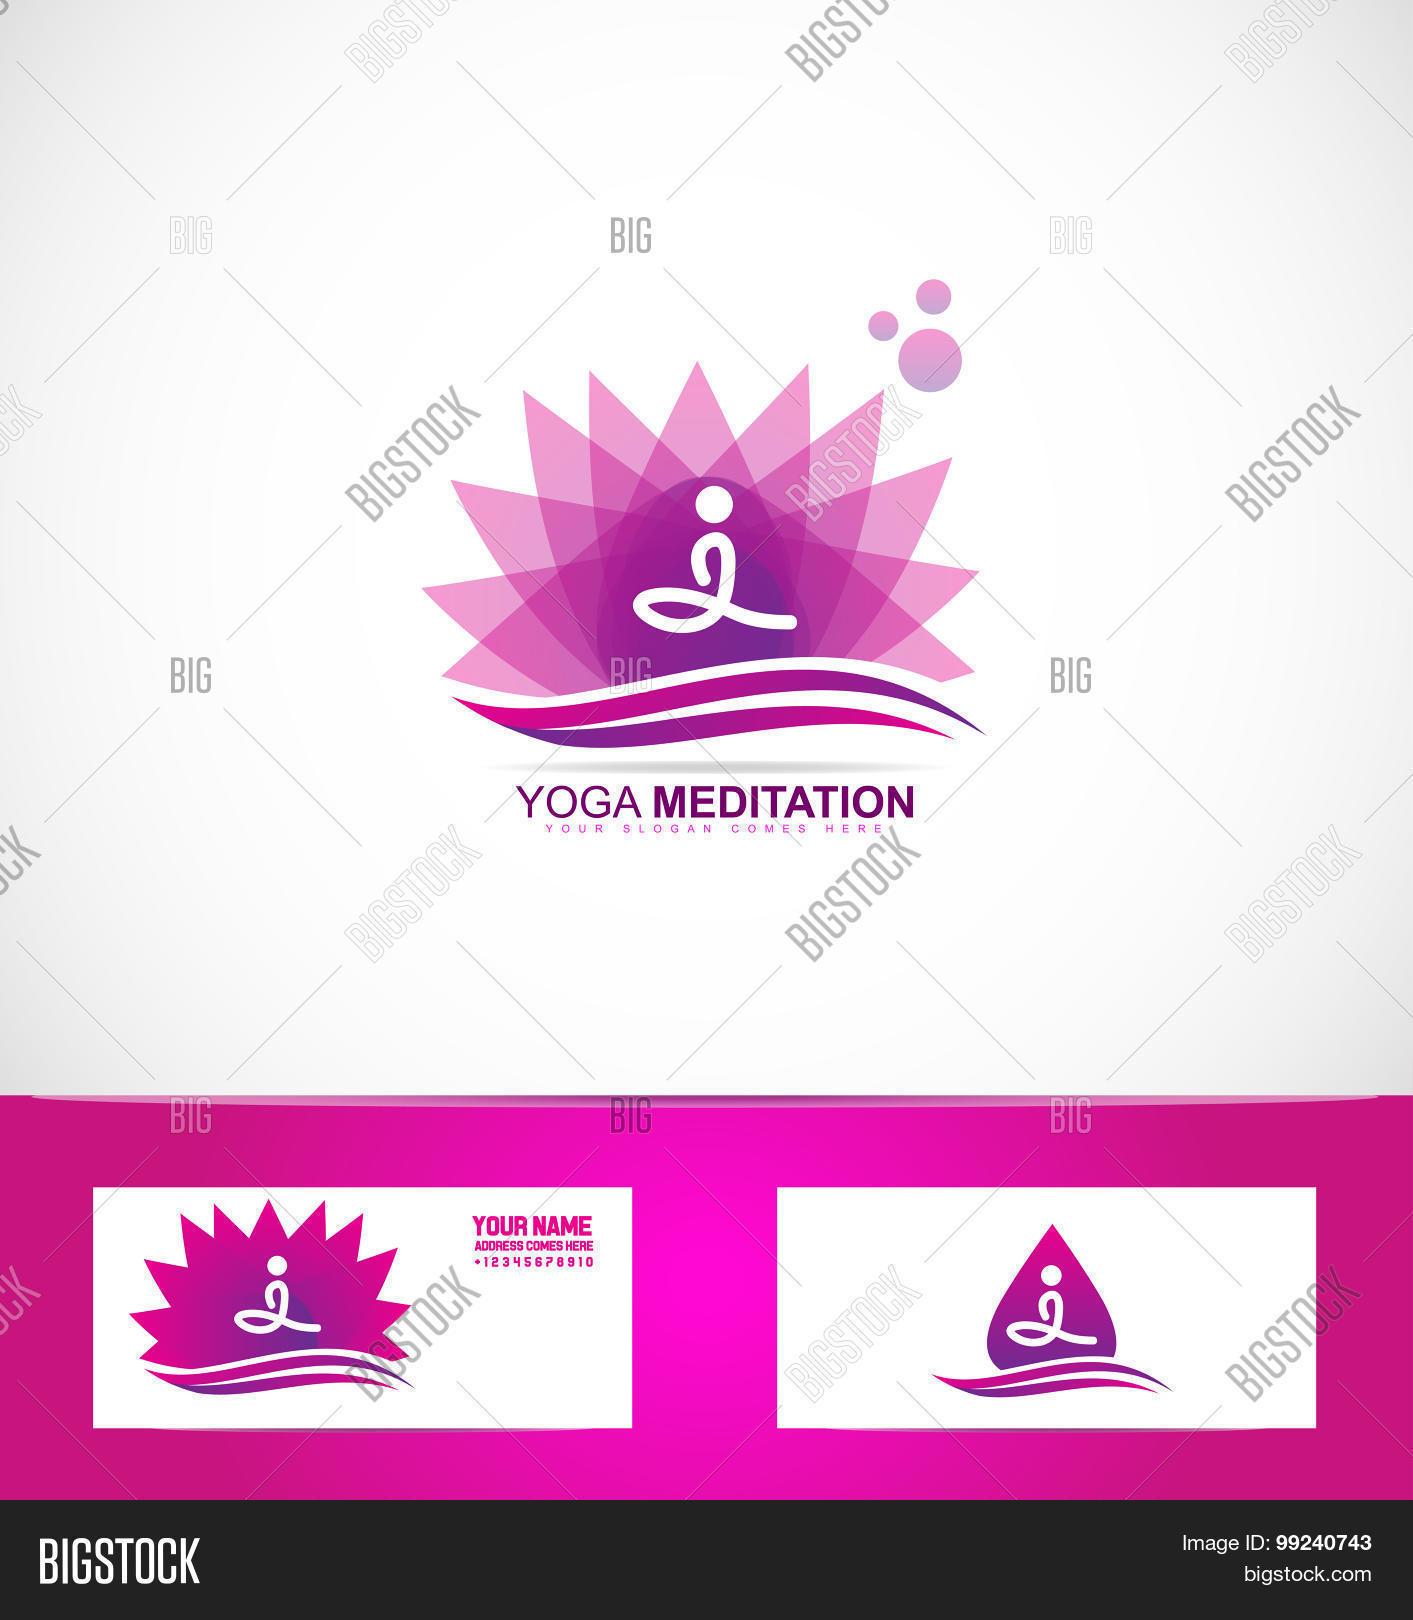 Yoga meditation lotus vector photo free trial bigstock yoga meditation lotus flower logo izmirmasajfo